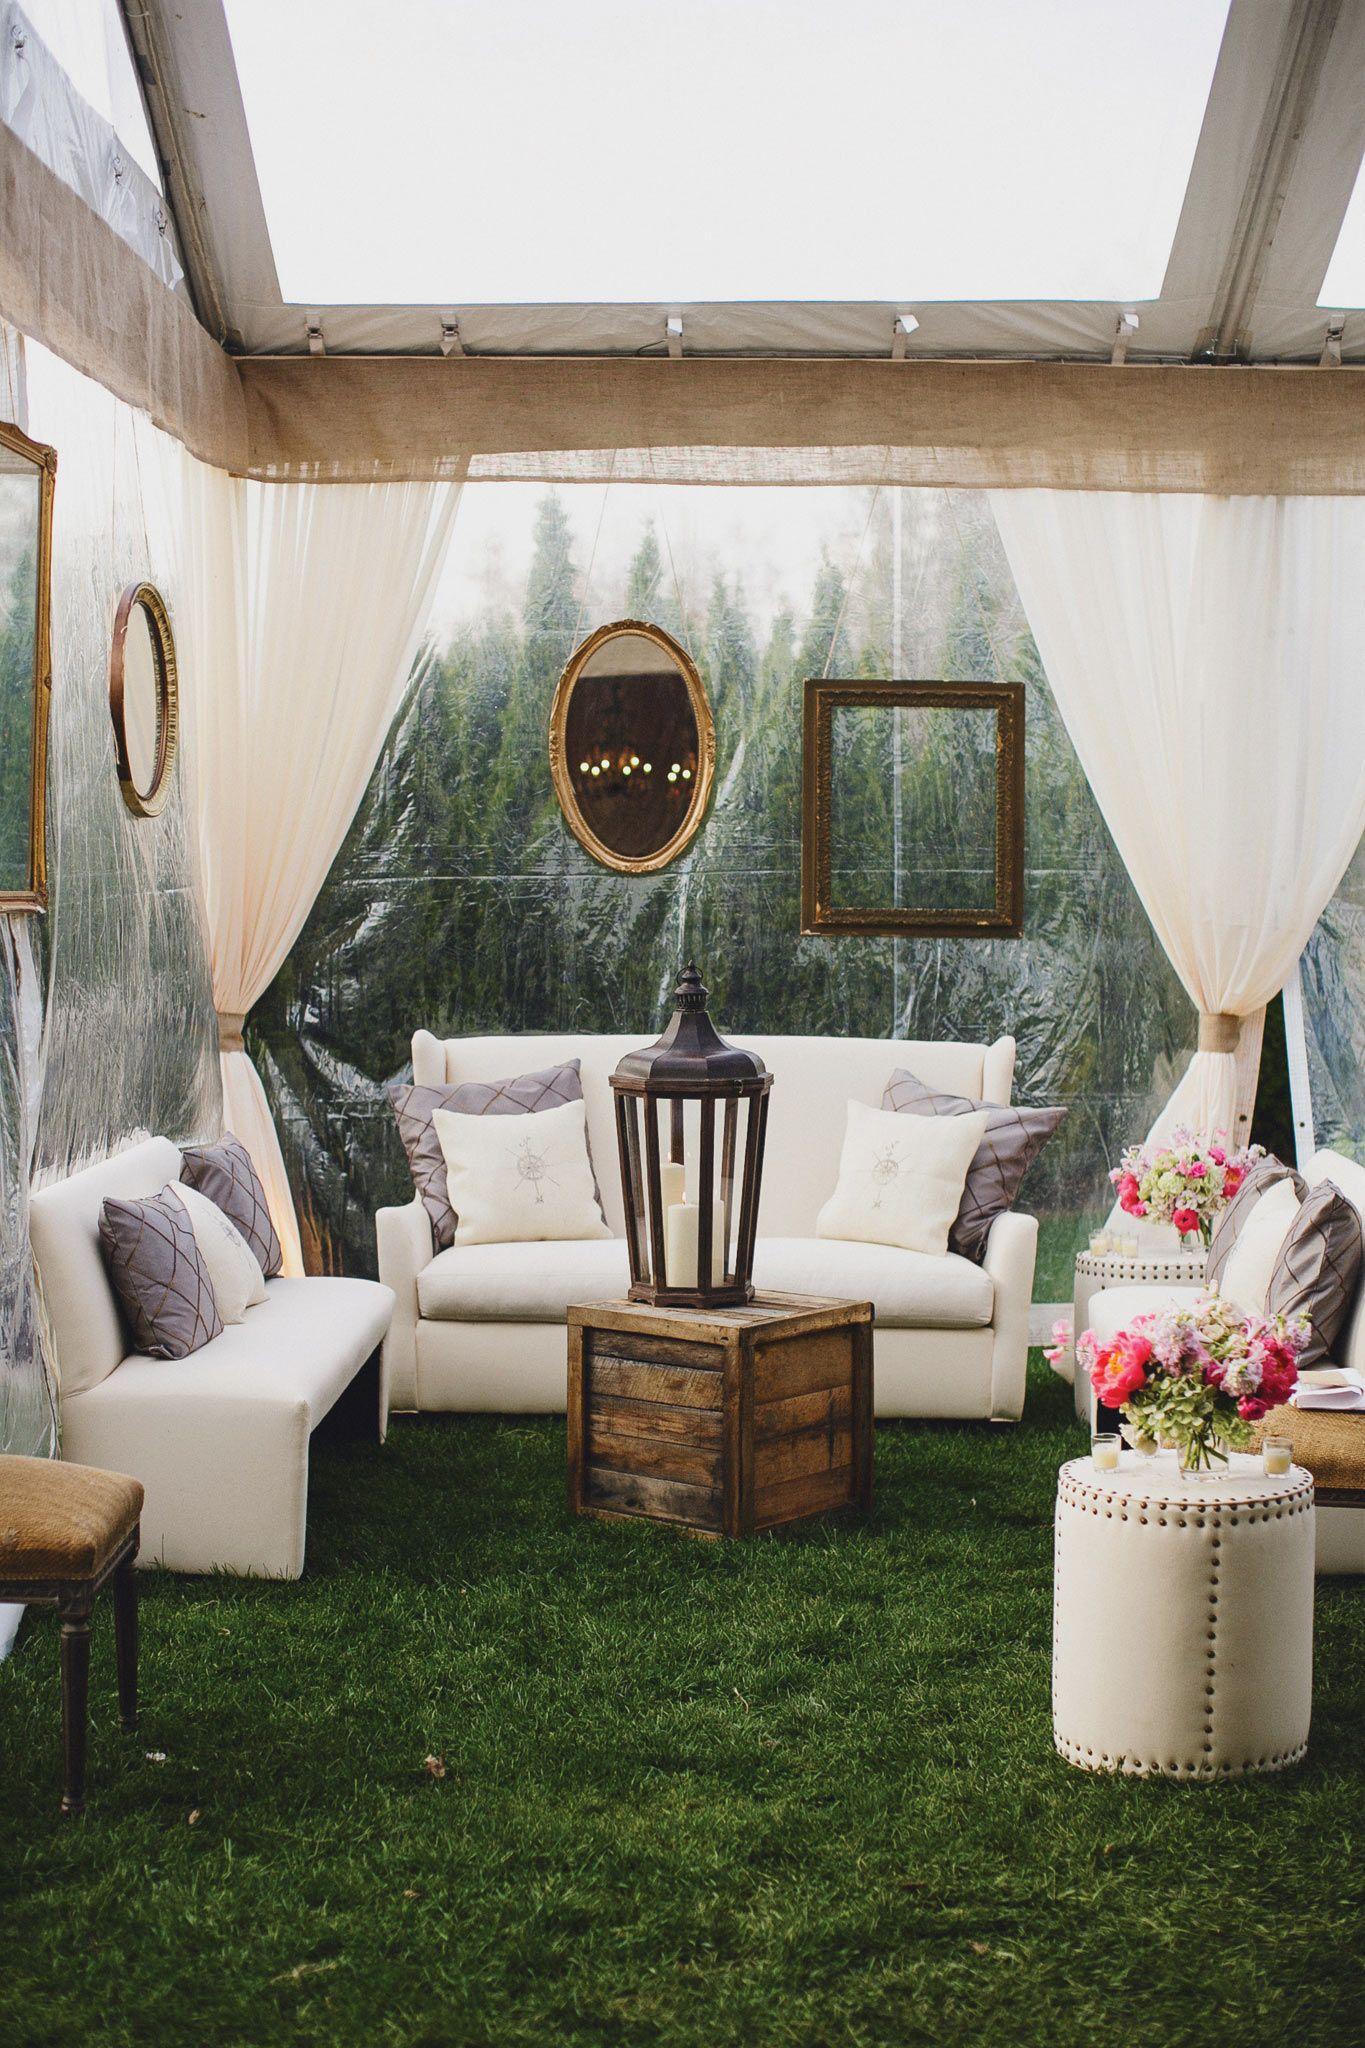 Plan a Wedding Under a Tent Tent decorations